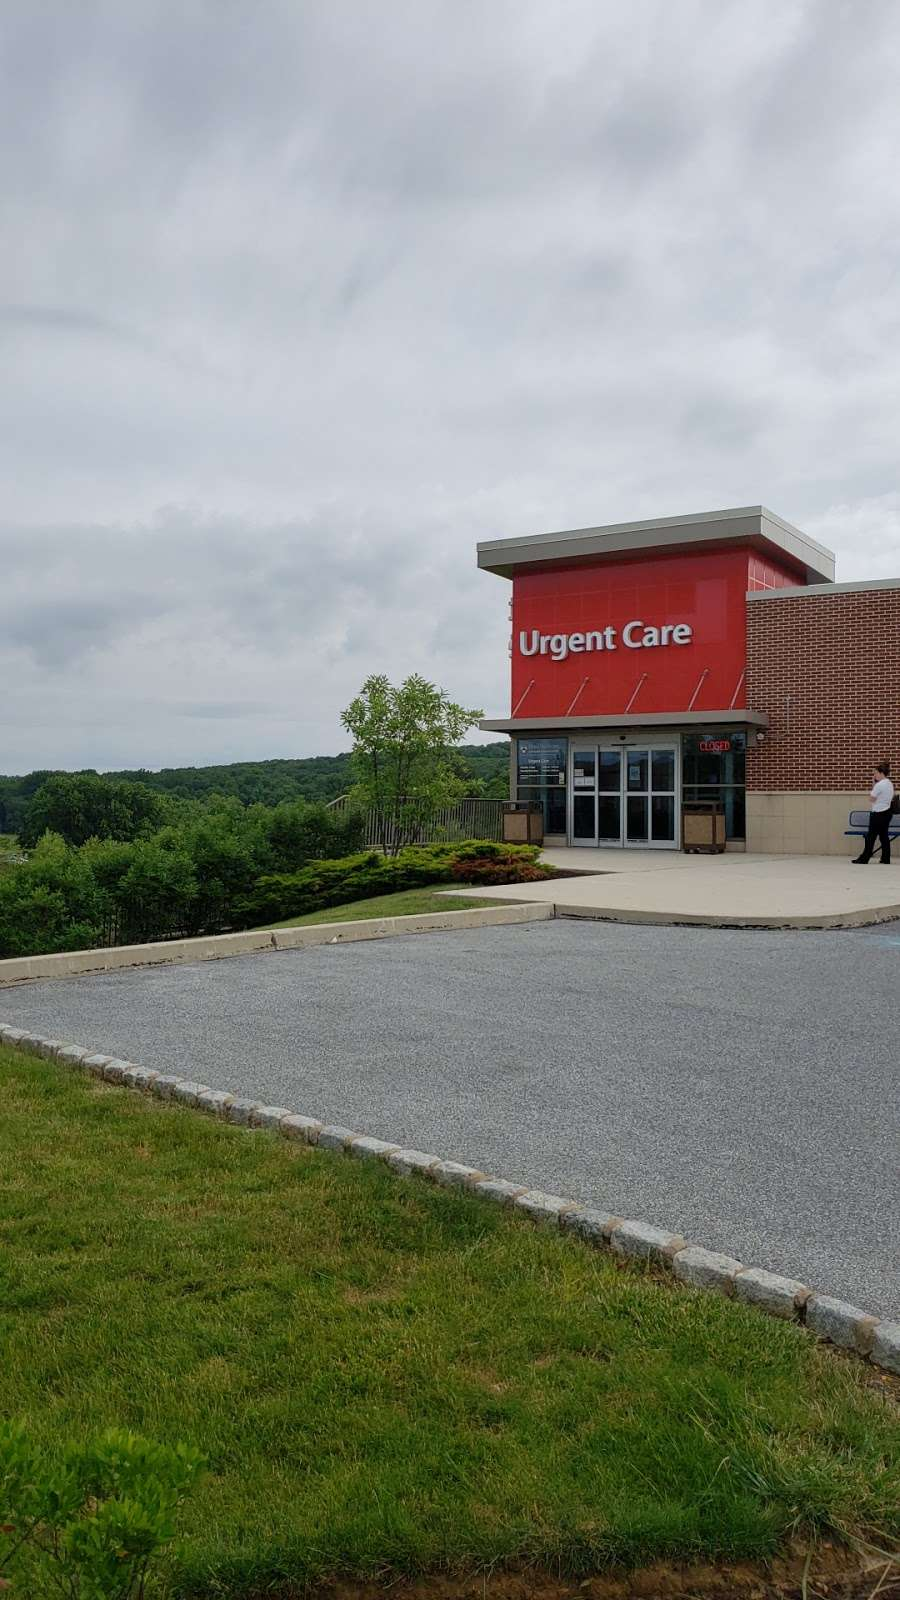 Parkesburg Urgent Care - hospital    Photo 2 of 2   Address: 950 Octorara Trail, Parkesburg, PA 19365, USA   Phone: (610) 857-6639